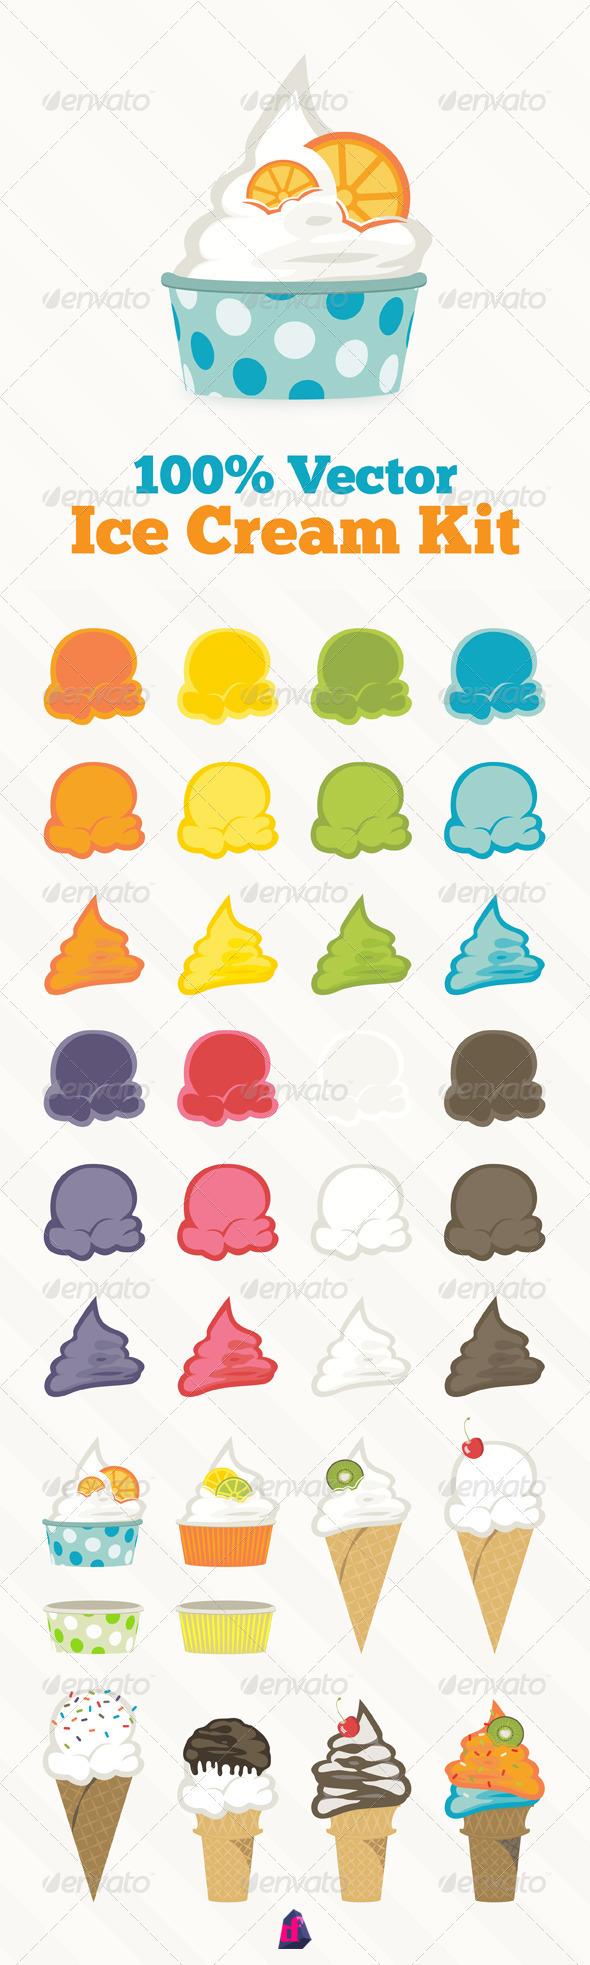 Ice Cream Kit - Food Objects